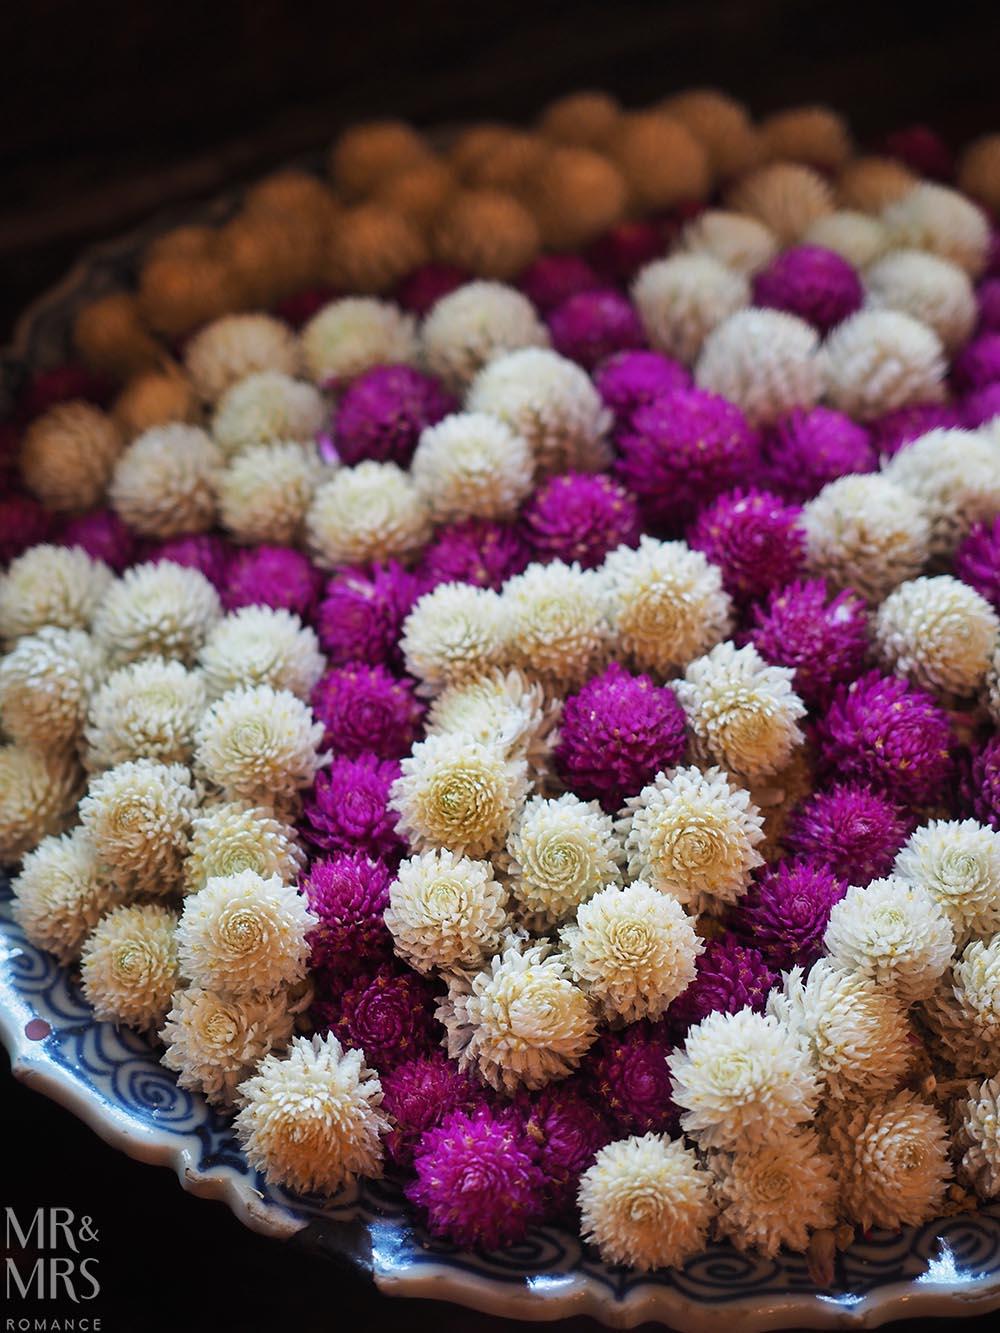 Flower markets, Bangkok, Thailand